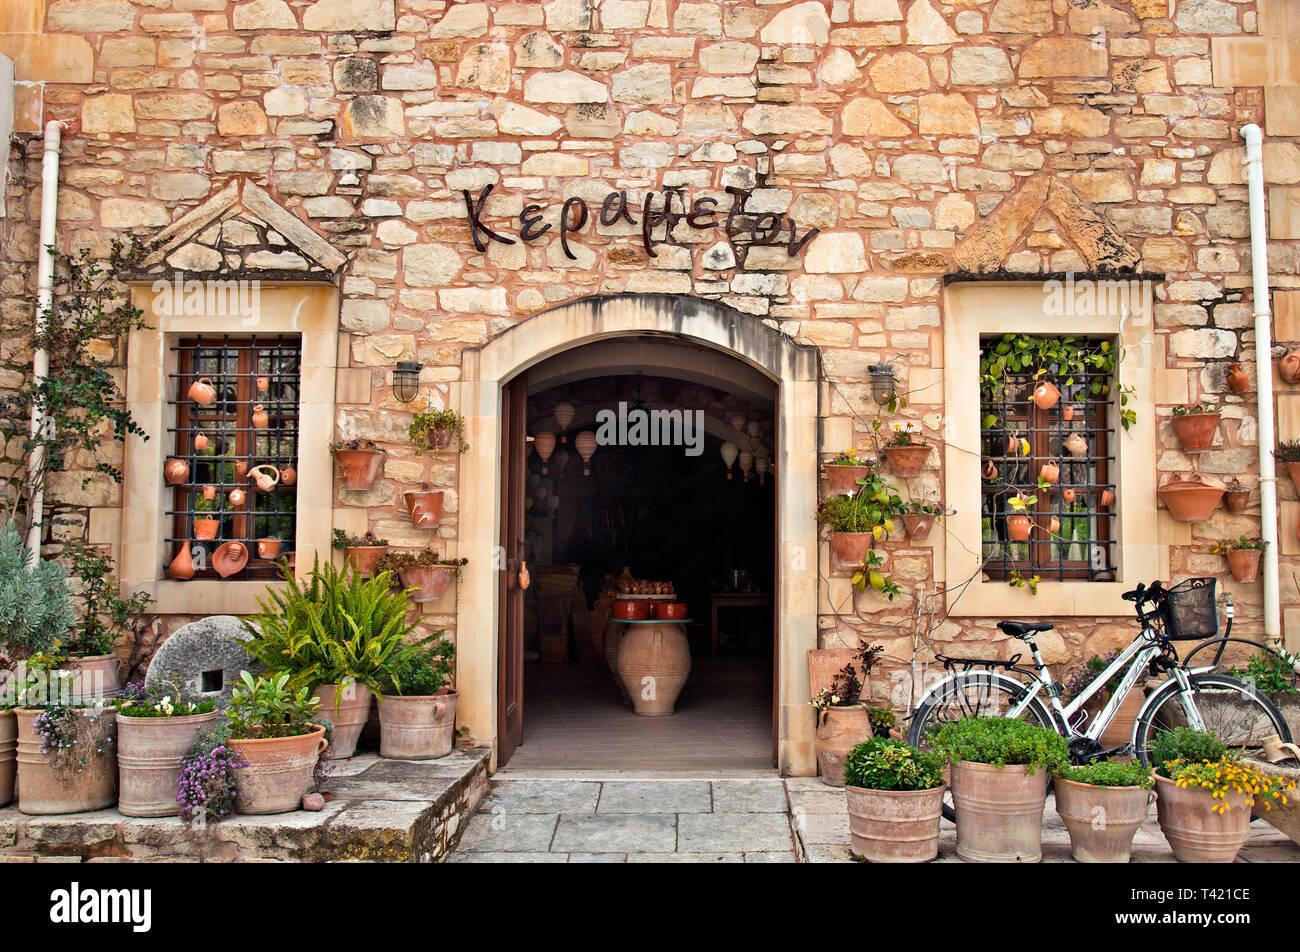 Ceramics art workshop in Margarites village, Rethimno, Crete, Greece. - Stock Image